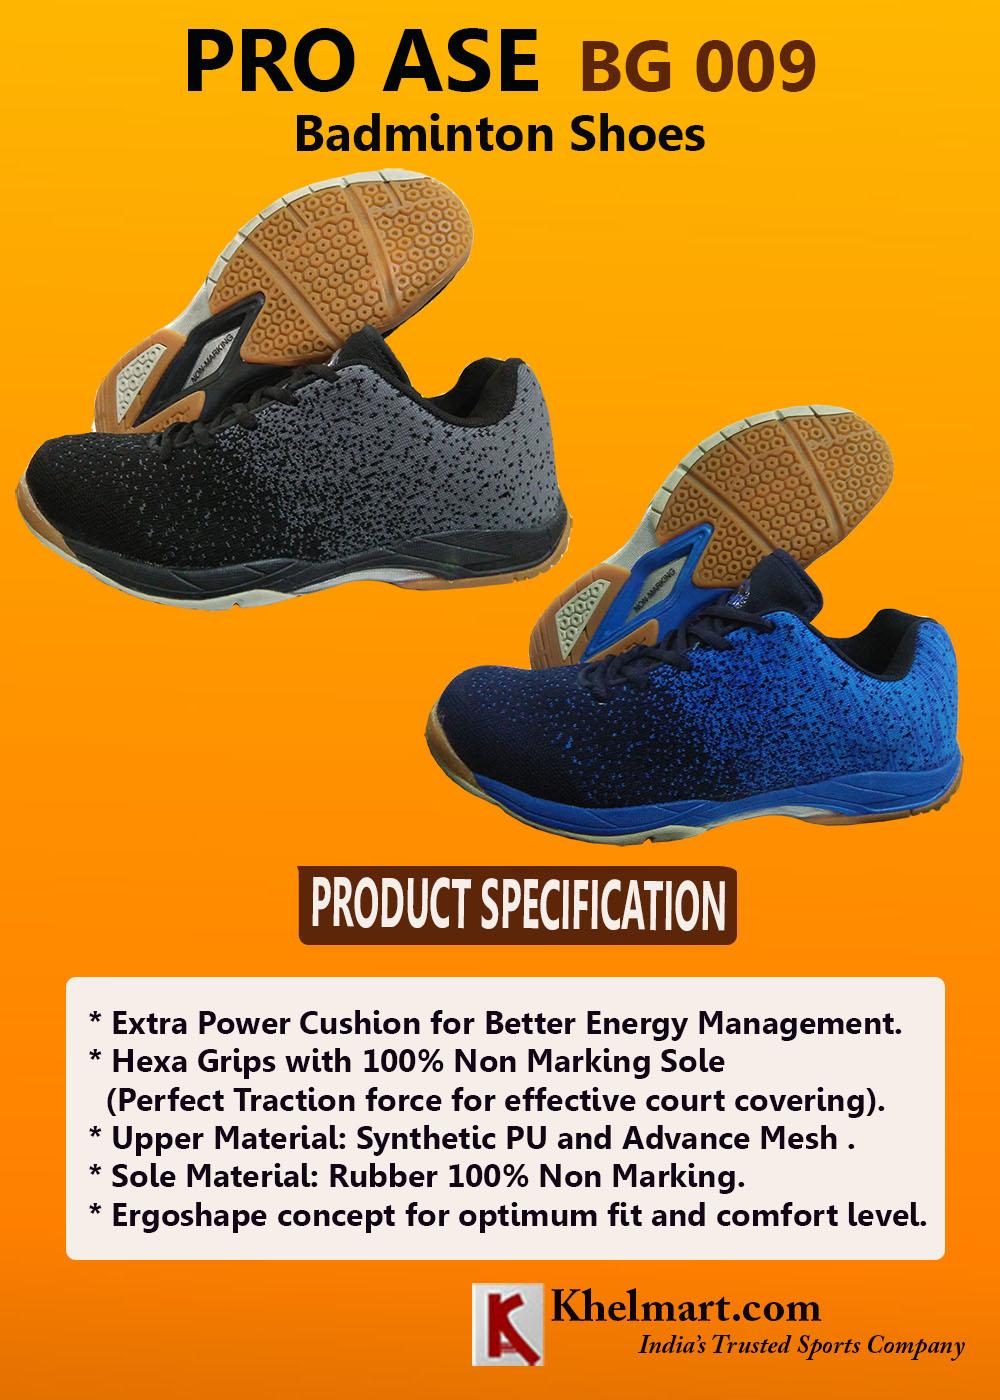 PRO ASE BG 009 Badminton Shoe